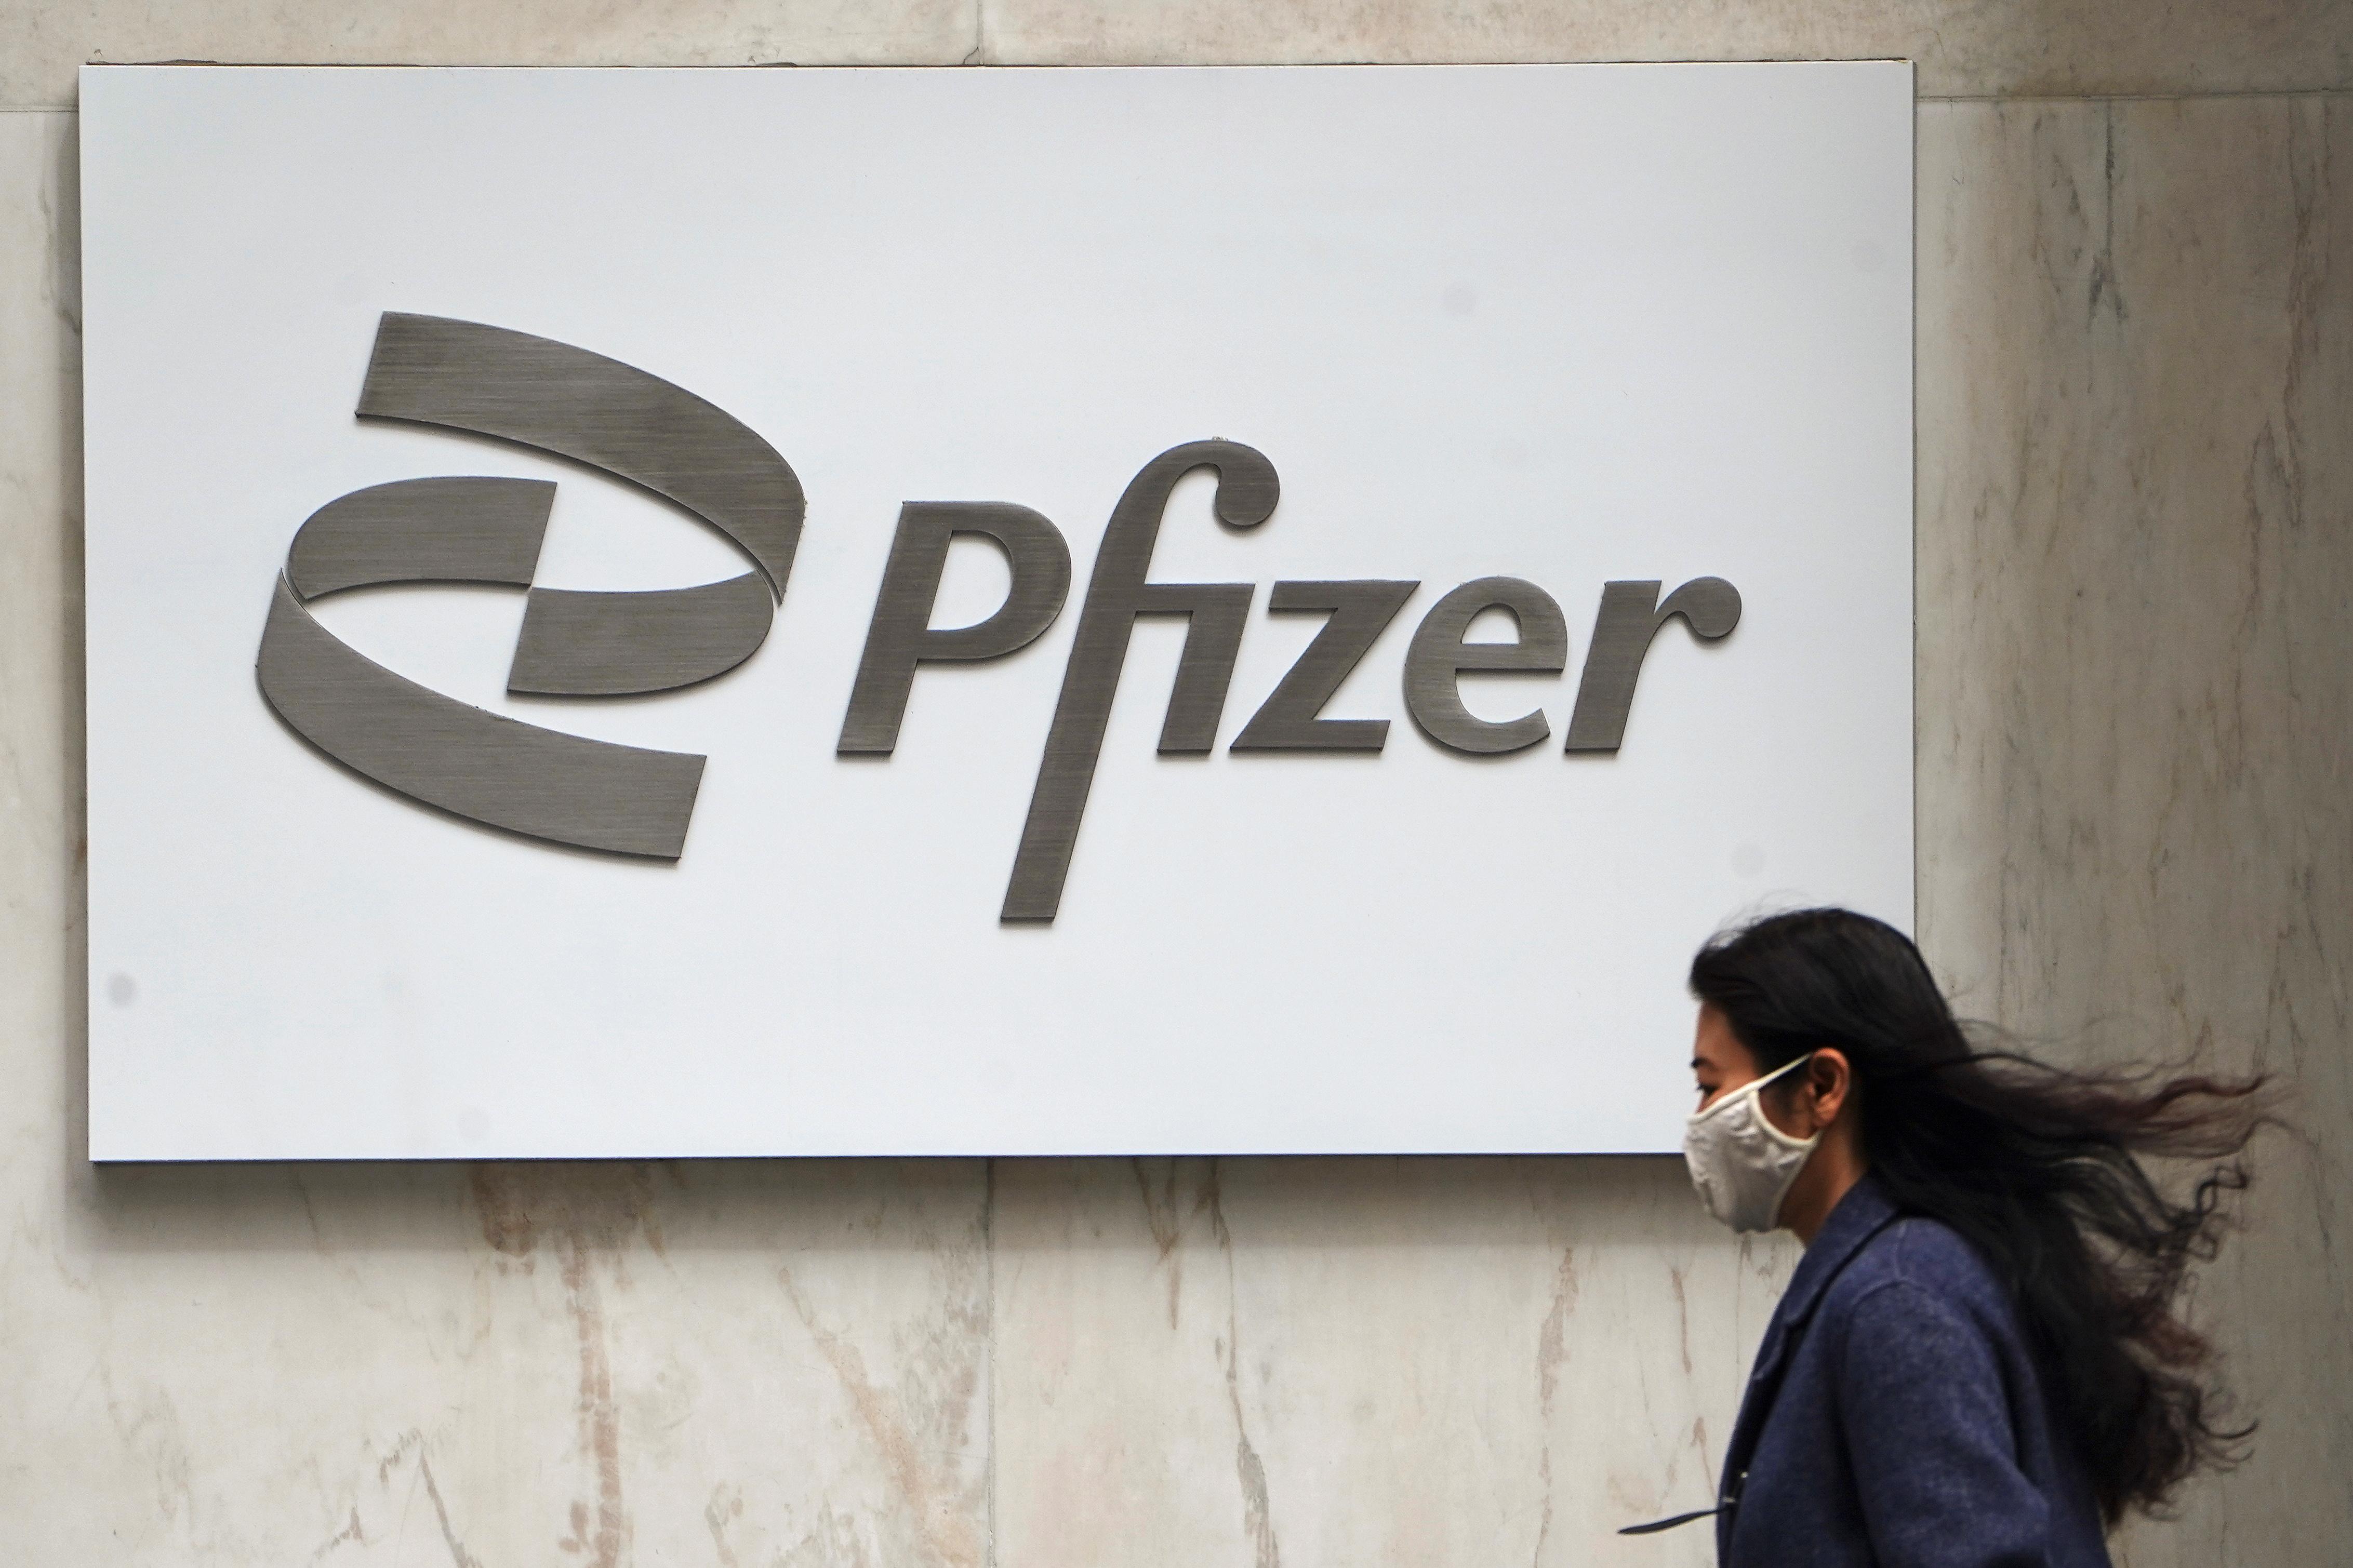 A person walks past a Pfizer logo amid the coronavirus disease (COVID-19) pandemic in the Manhattan borough of New York City, New York, U.S., April 1, 2021. REUTERS/Carlo Allegri